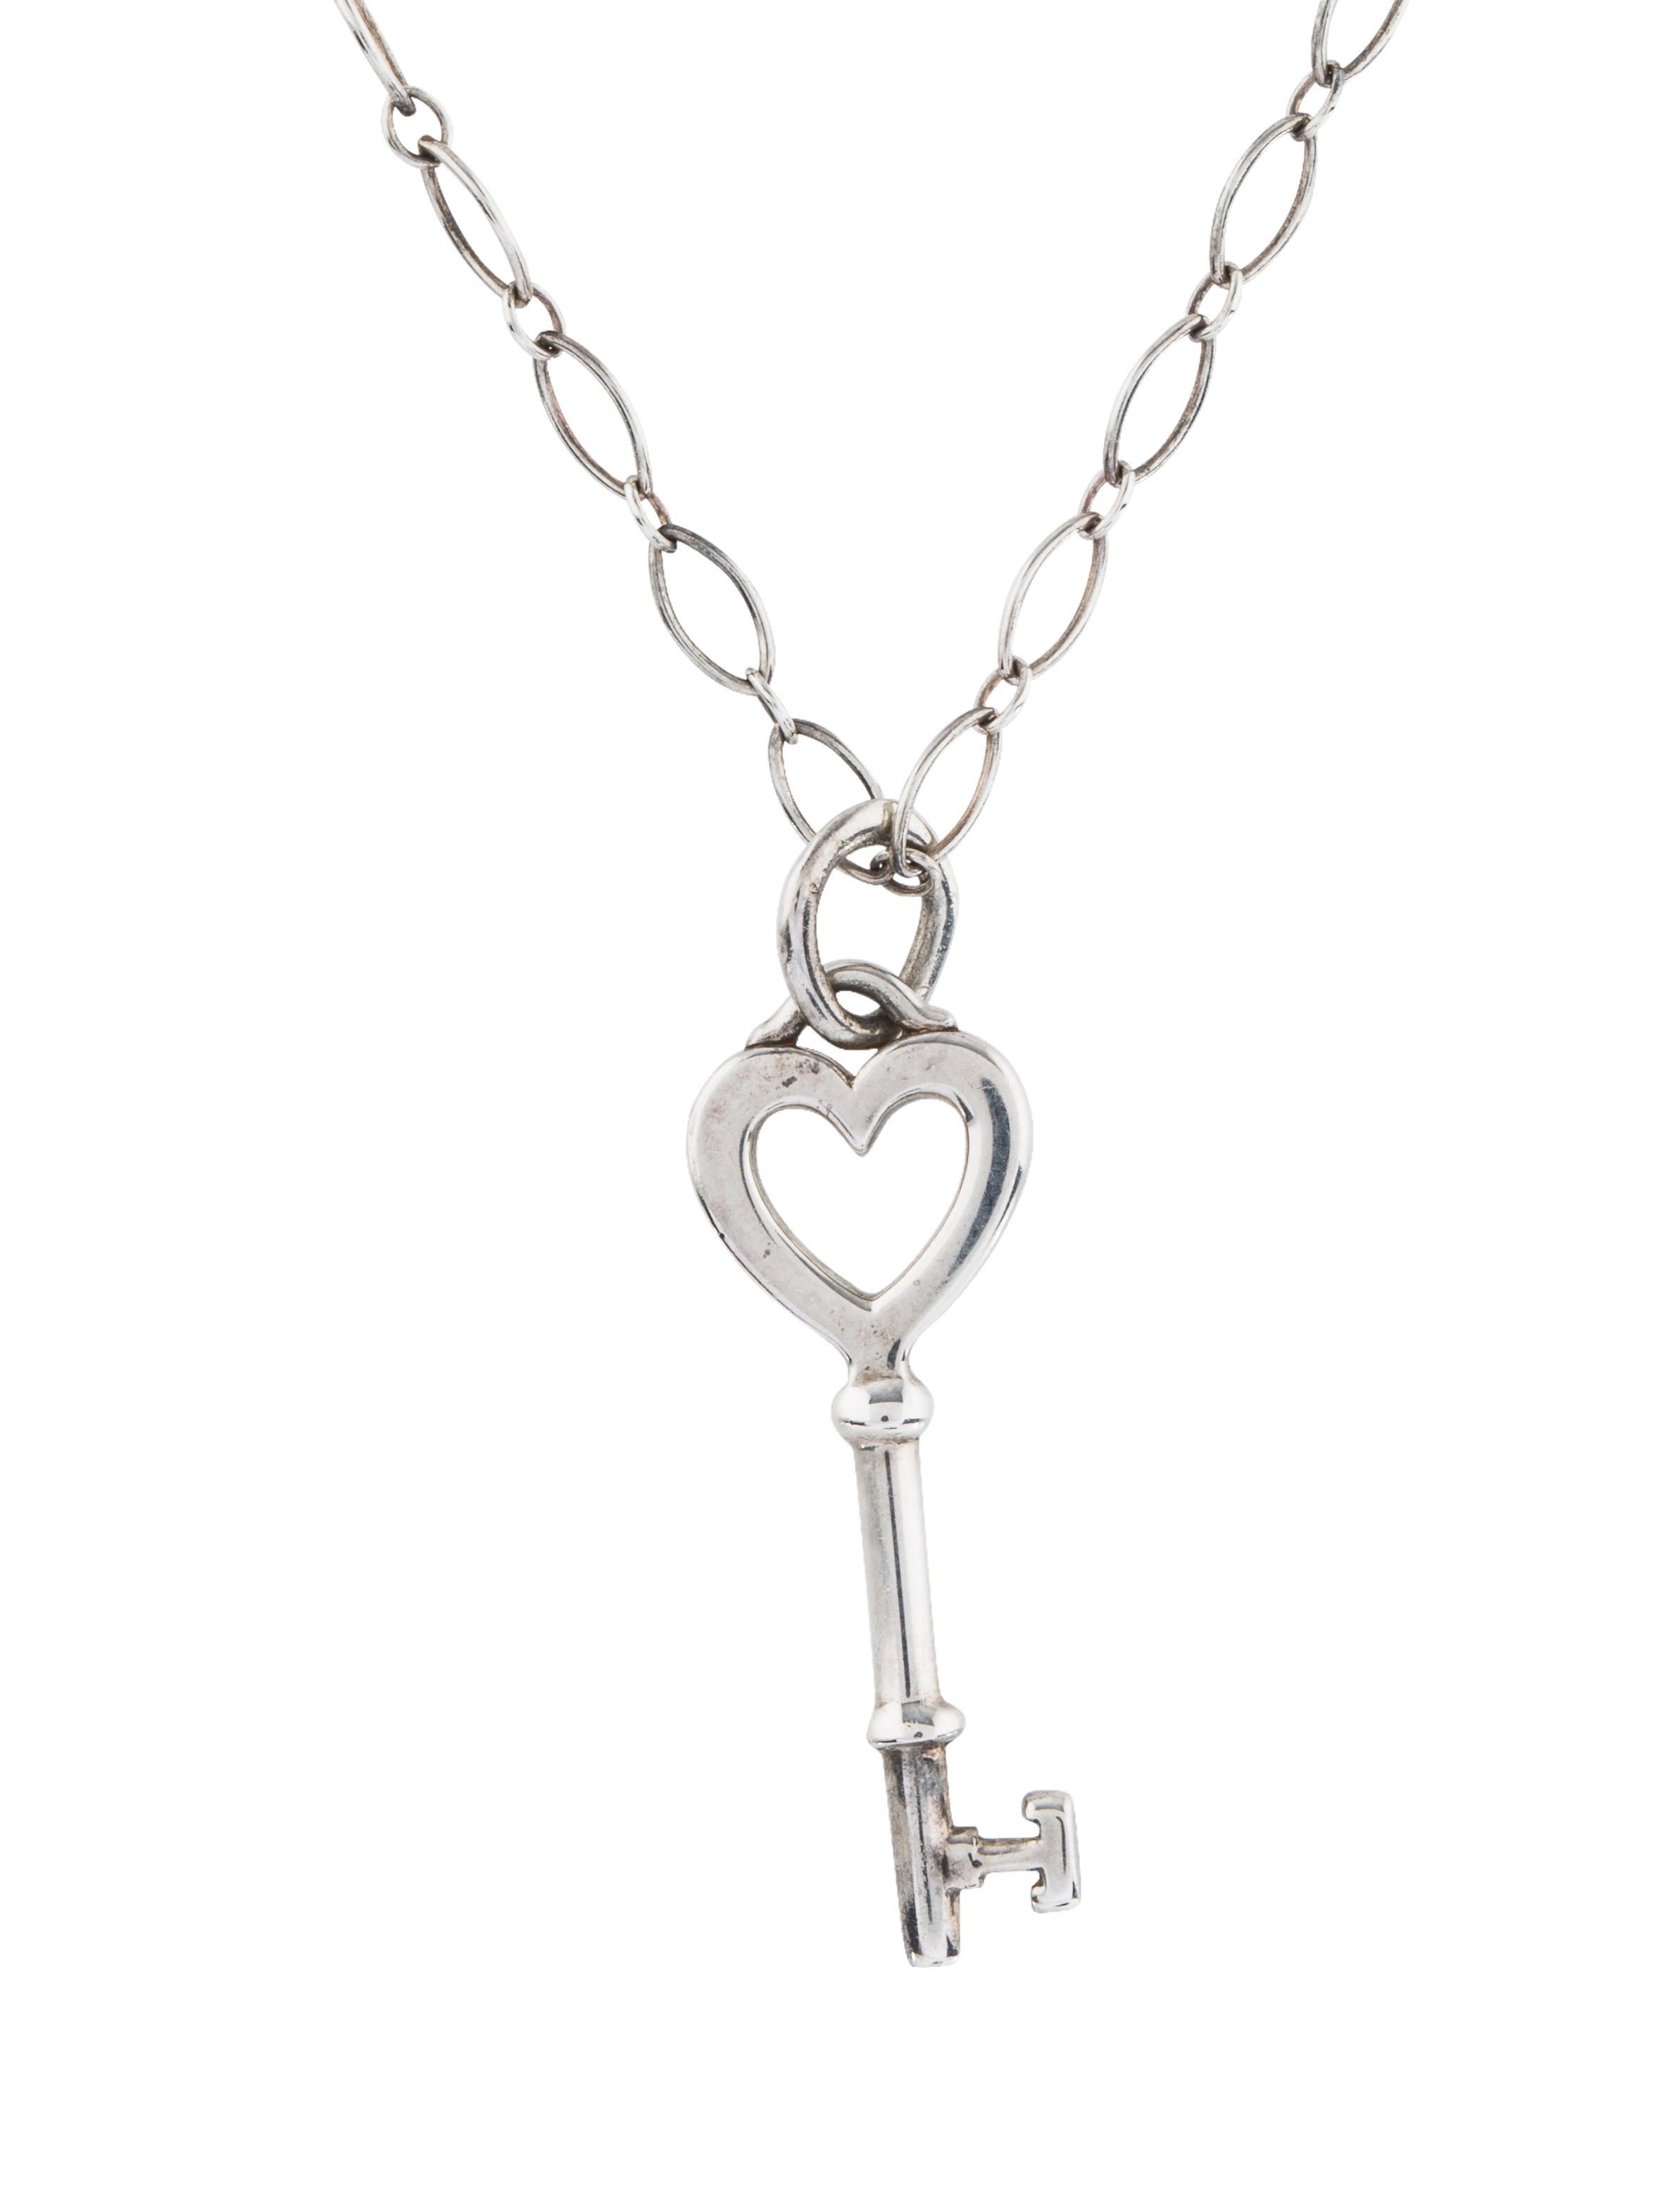 Tiffany co heart key pendant necklace necklaces tif76436 heart key pendant necklace aloadofball Choice Image